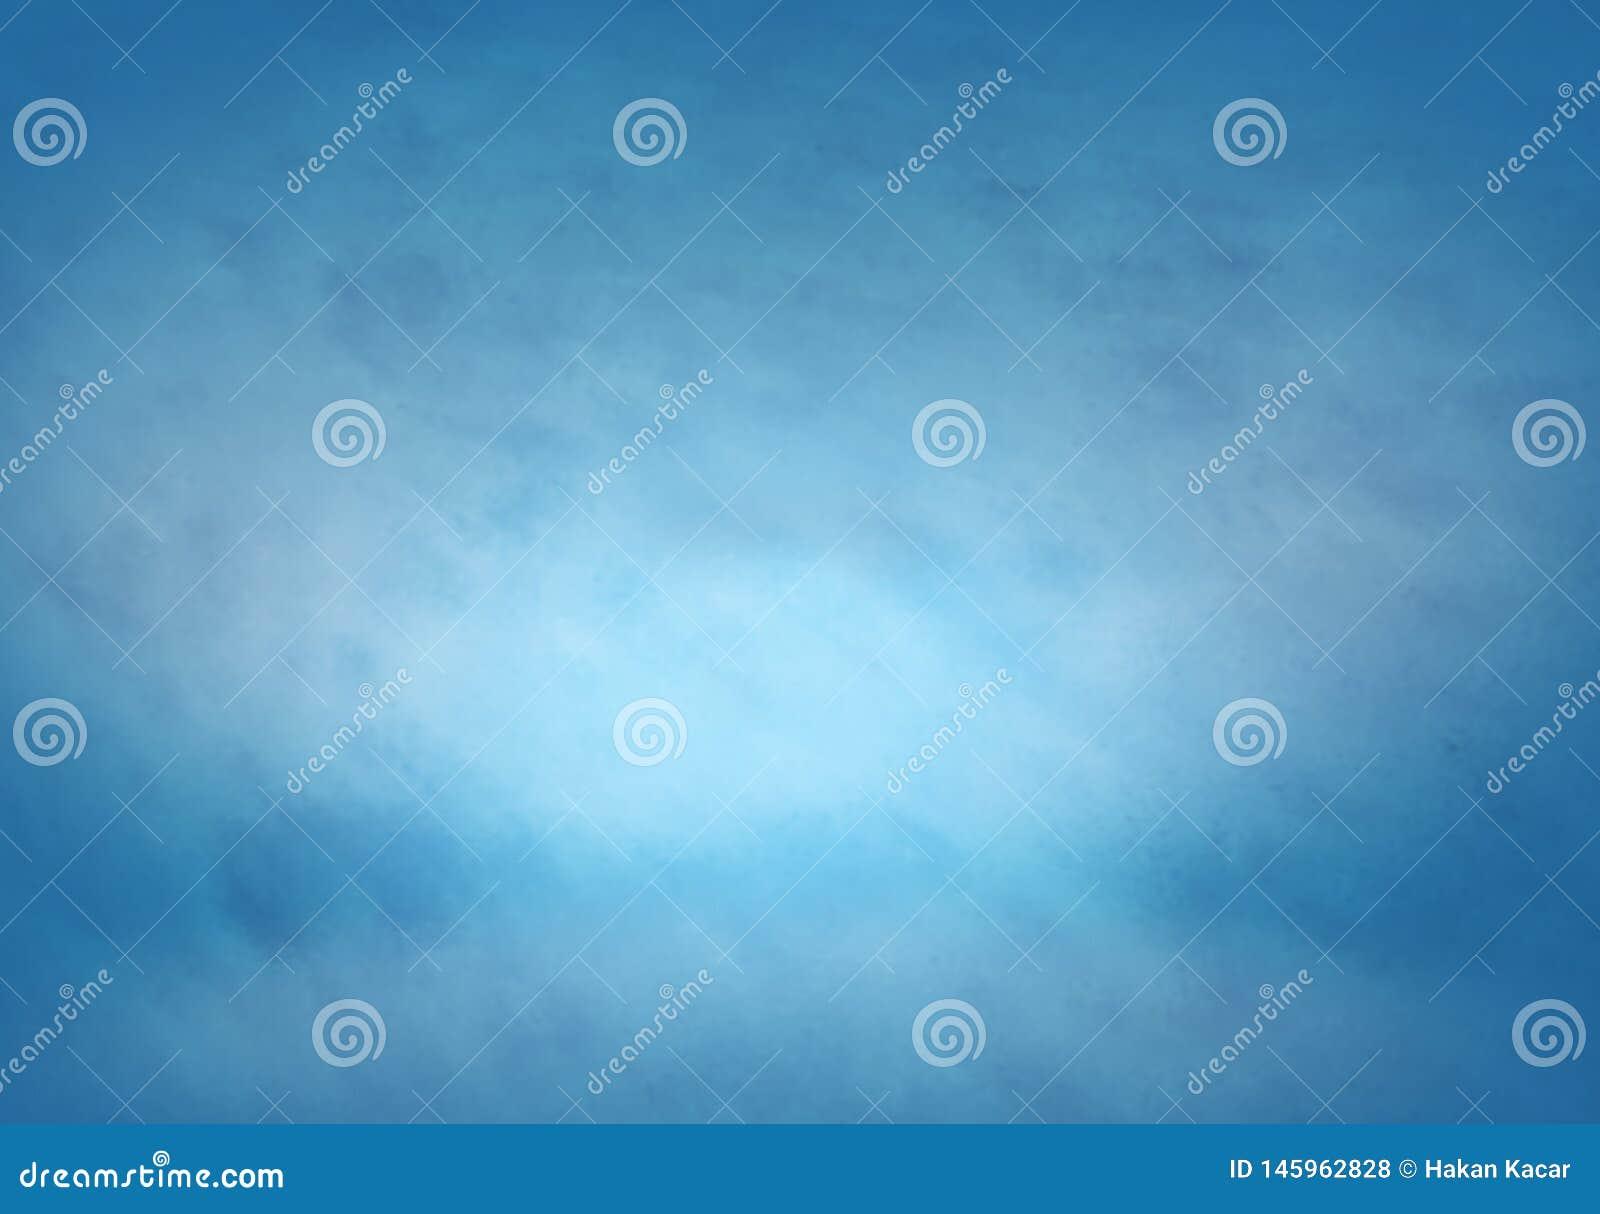 Ice blue background, texture ice.